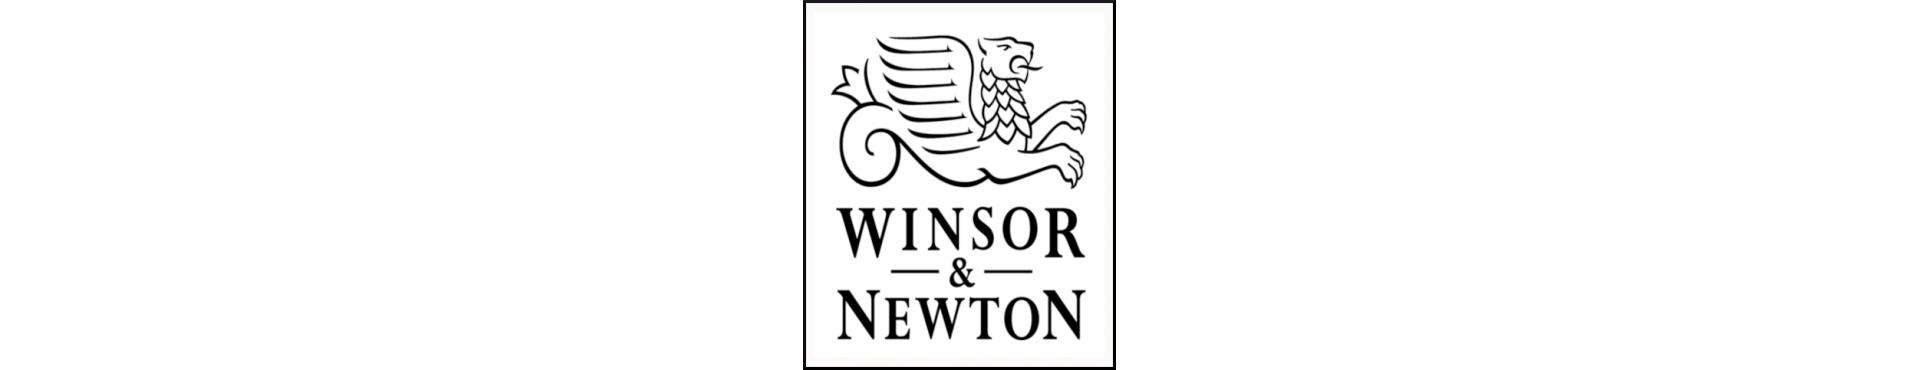 Tintas Winsor & Newton